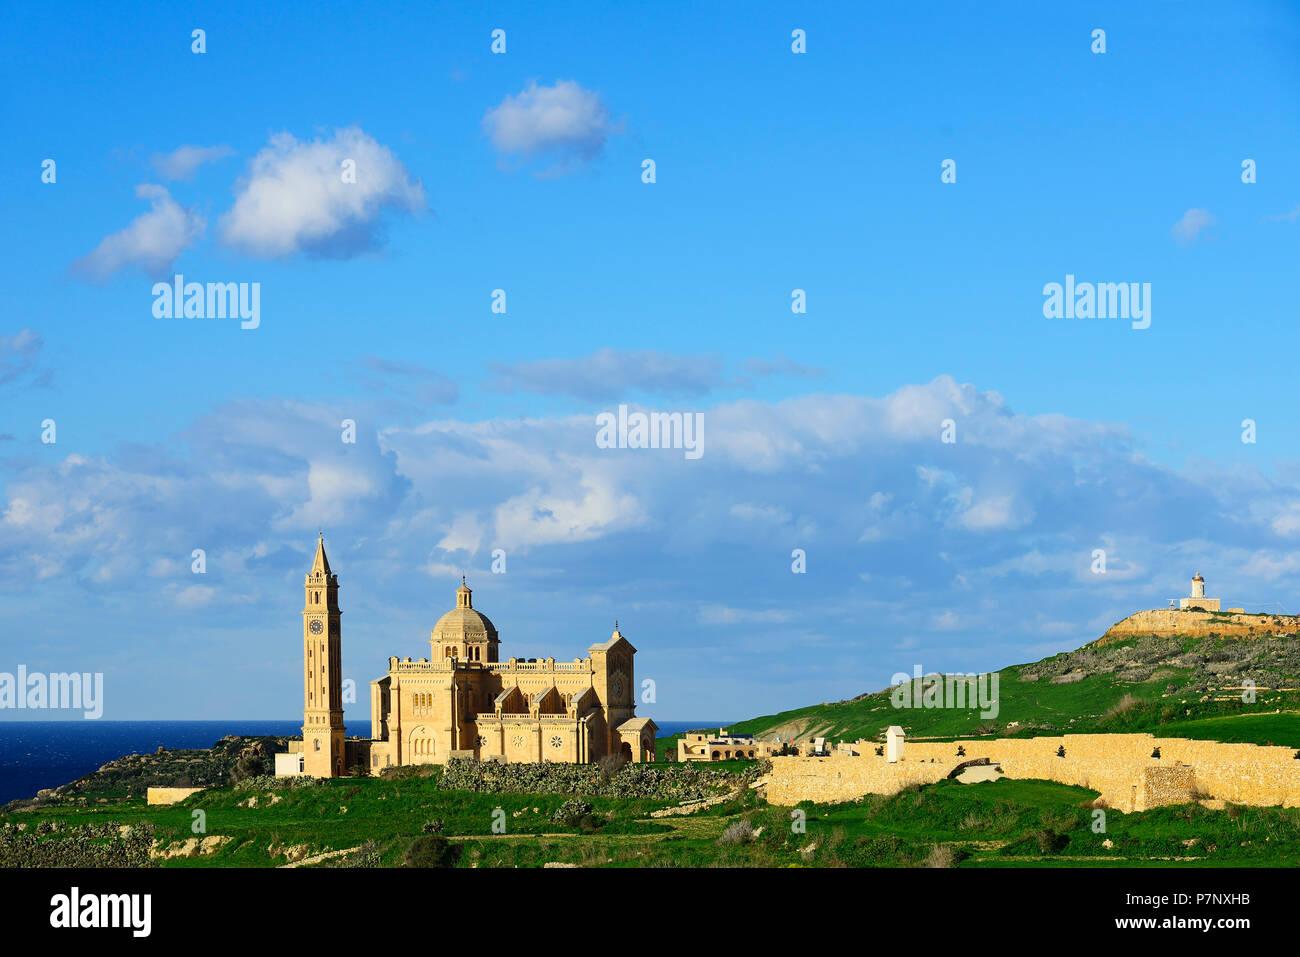 Ta' Pinu Basilica, Gharb, Gozo Island, Malta - Stock Image